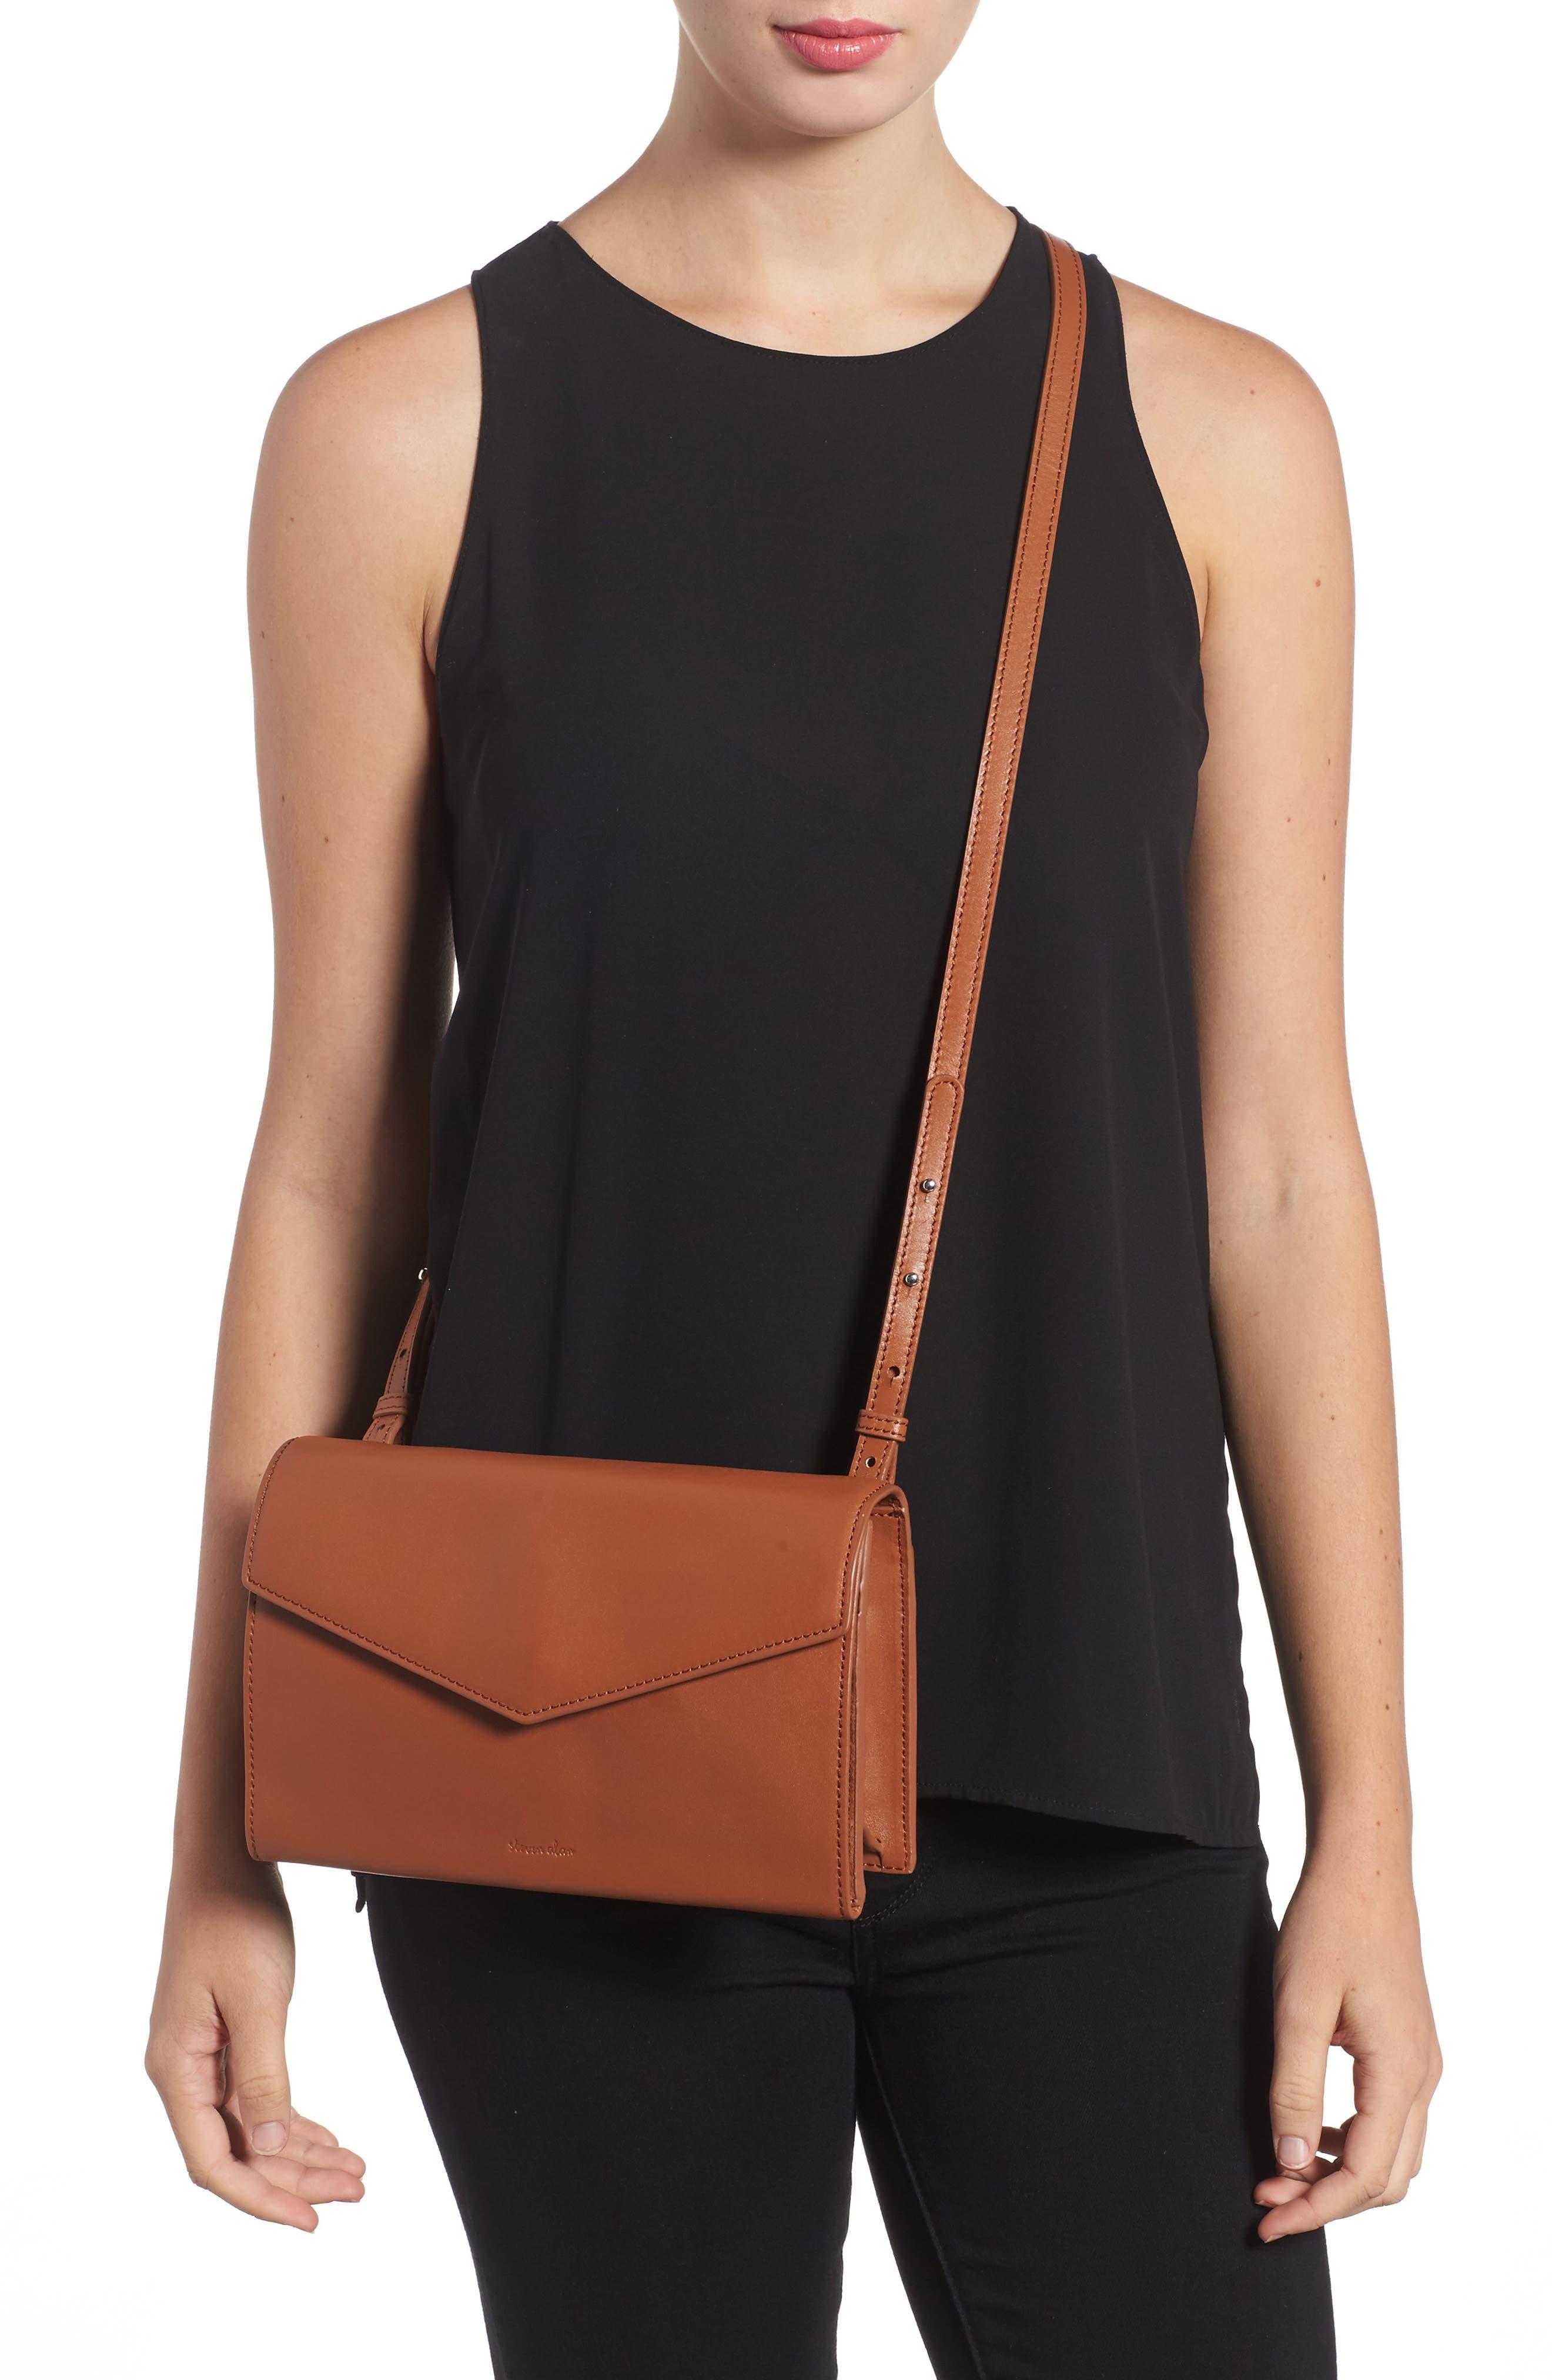 Easton Leather Envelope Crossbody Bag,                             Alternate thumbnail 2, color,                             200